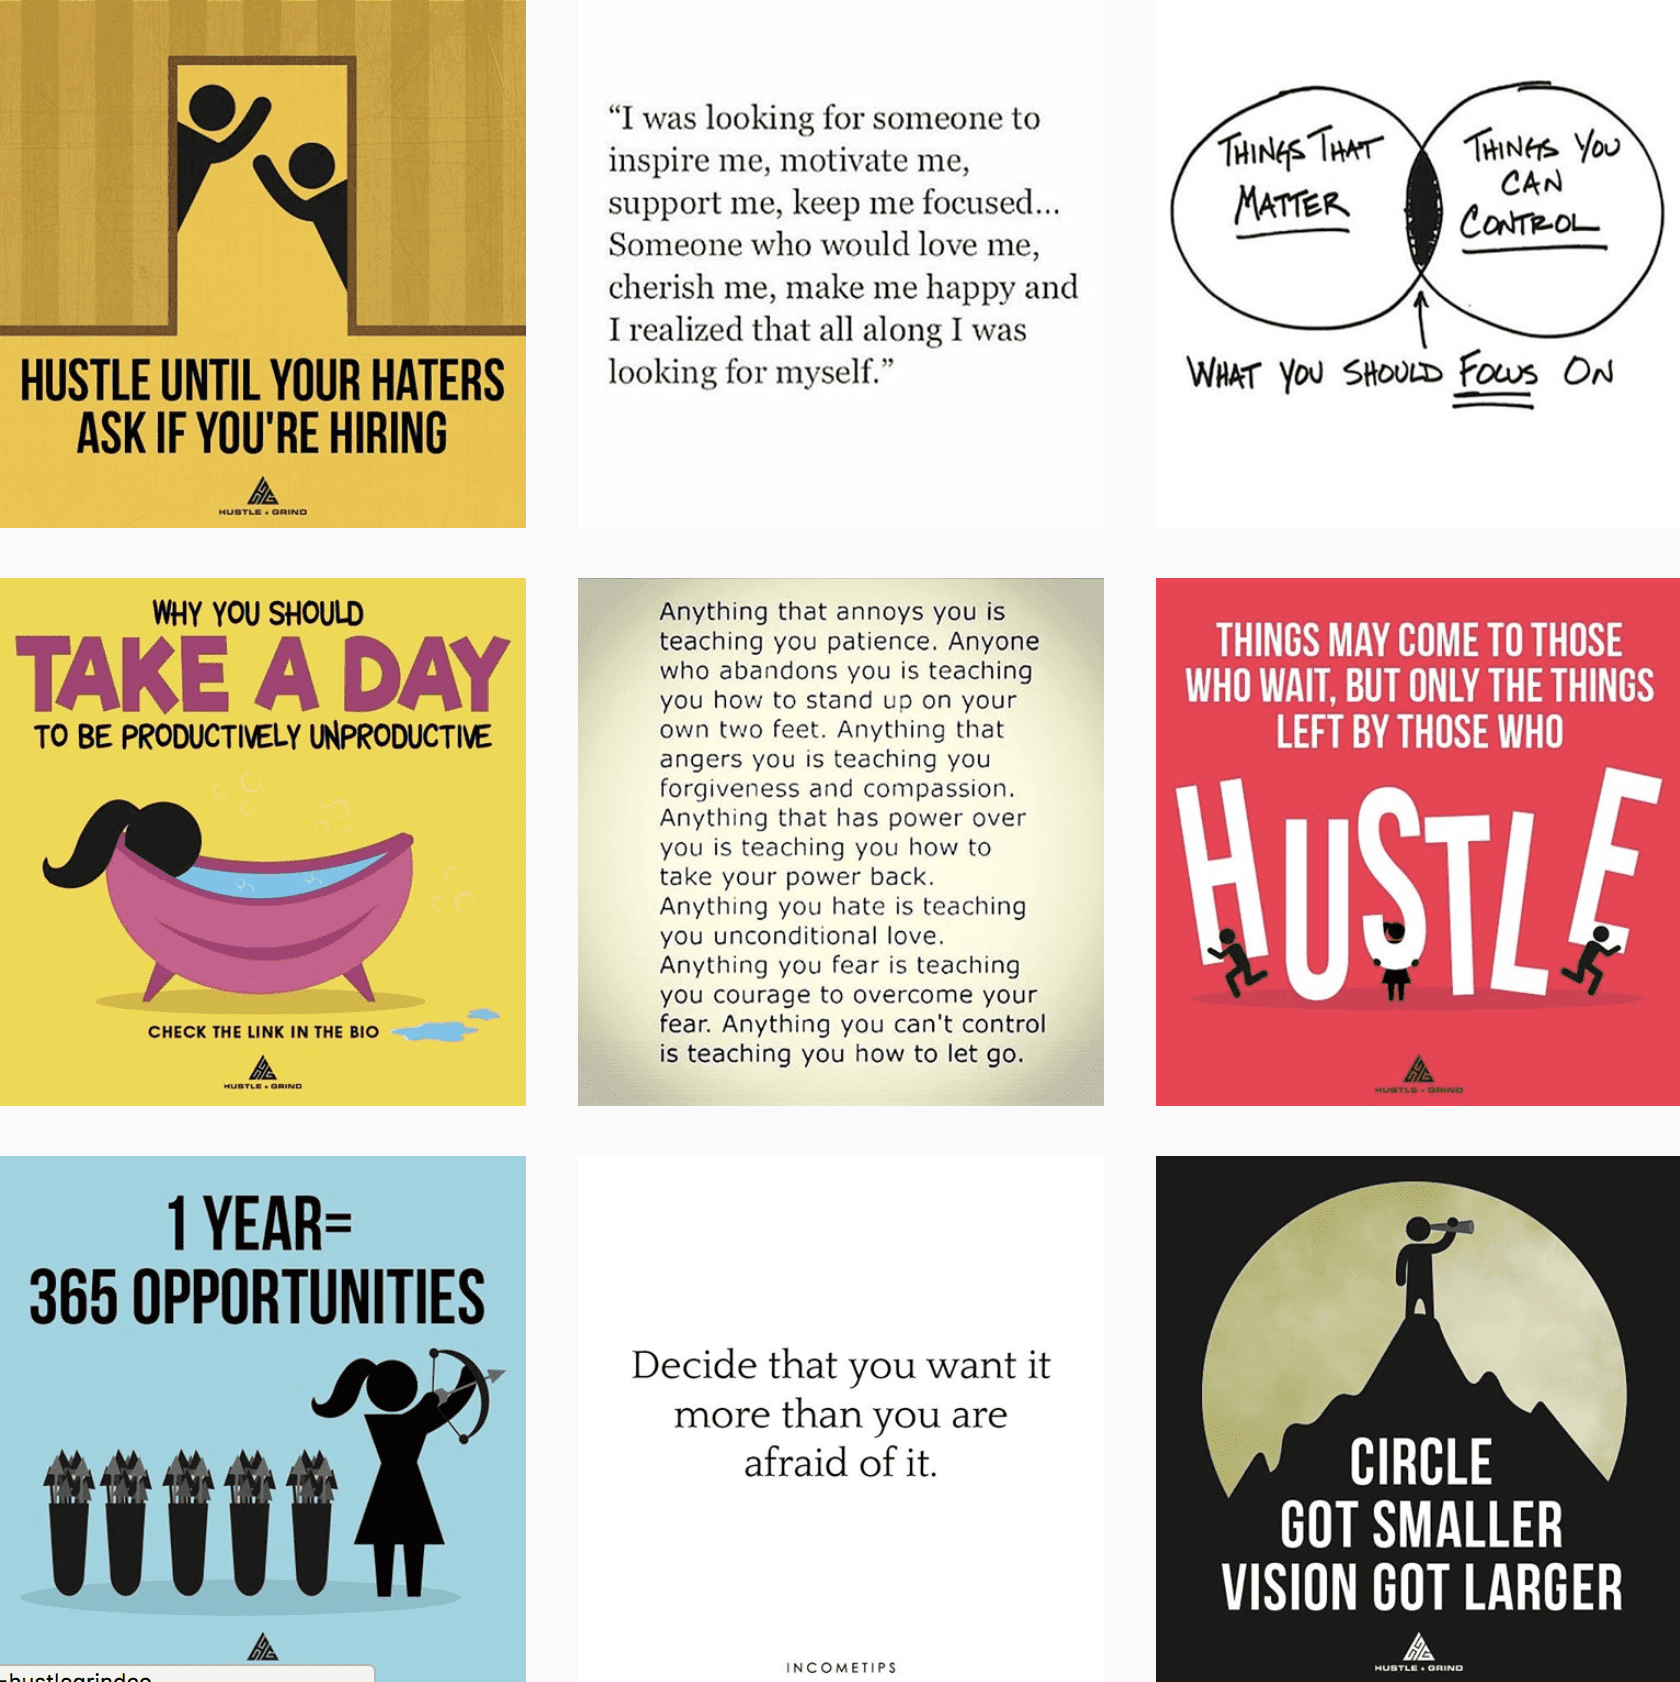 Hustle and Grind Instagram feed